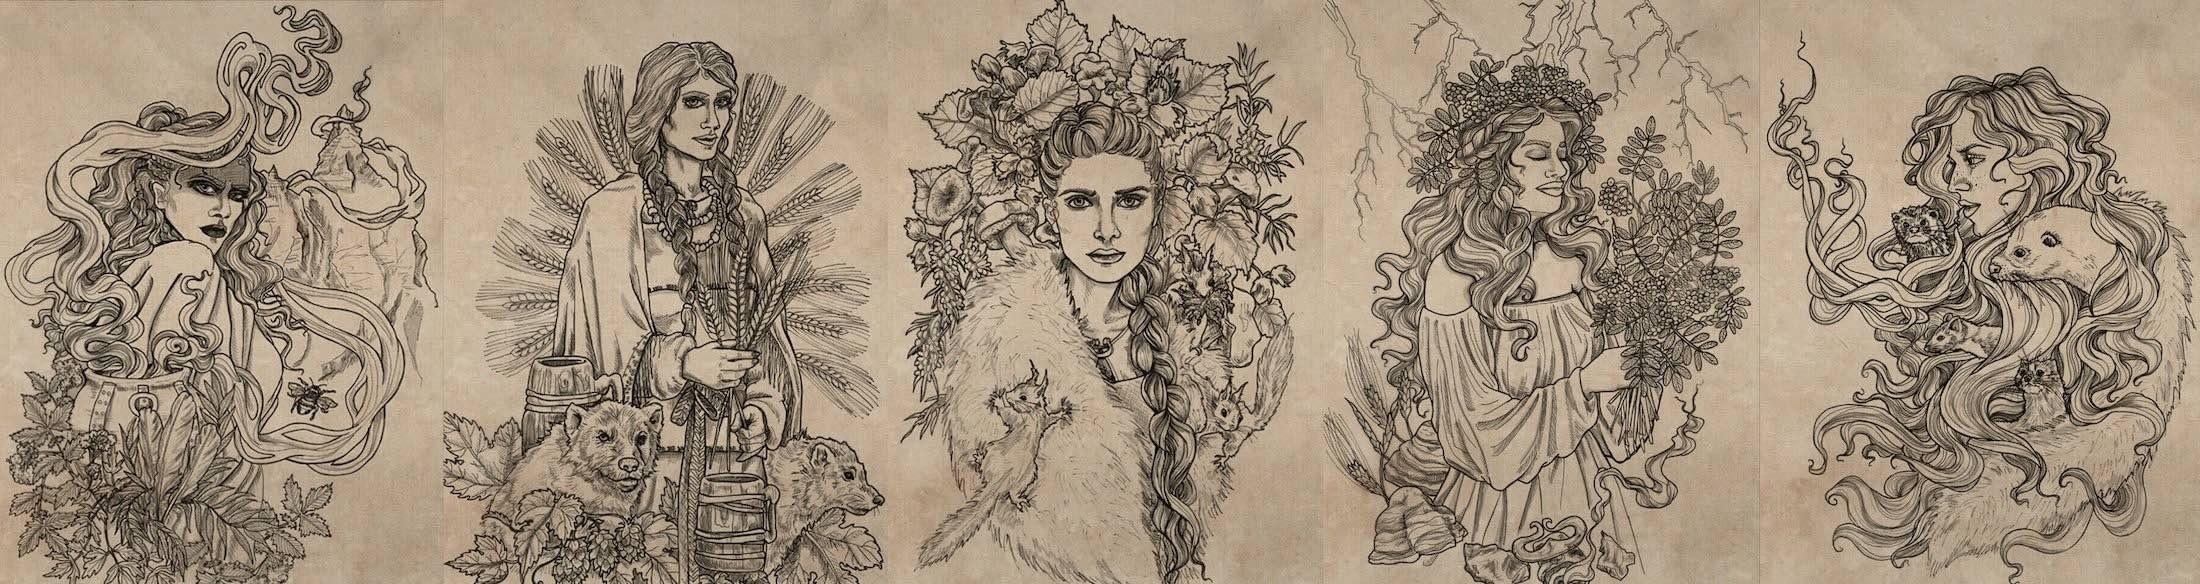 Nordic Goddesses from Finland Mythology - image by Tytti Leiwo - Nordic Wisdom